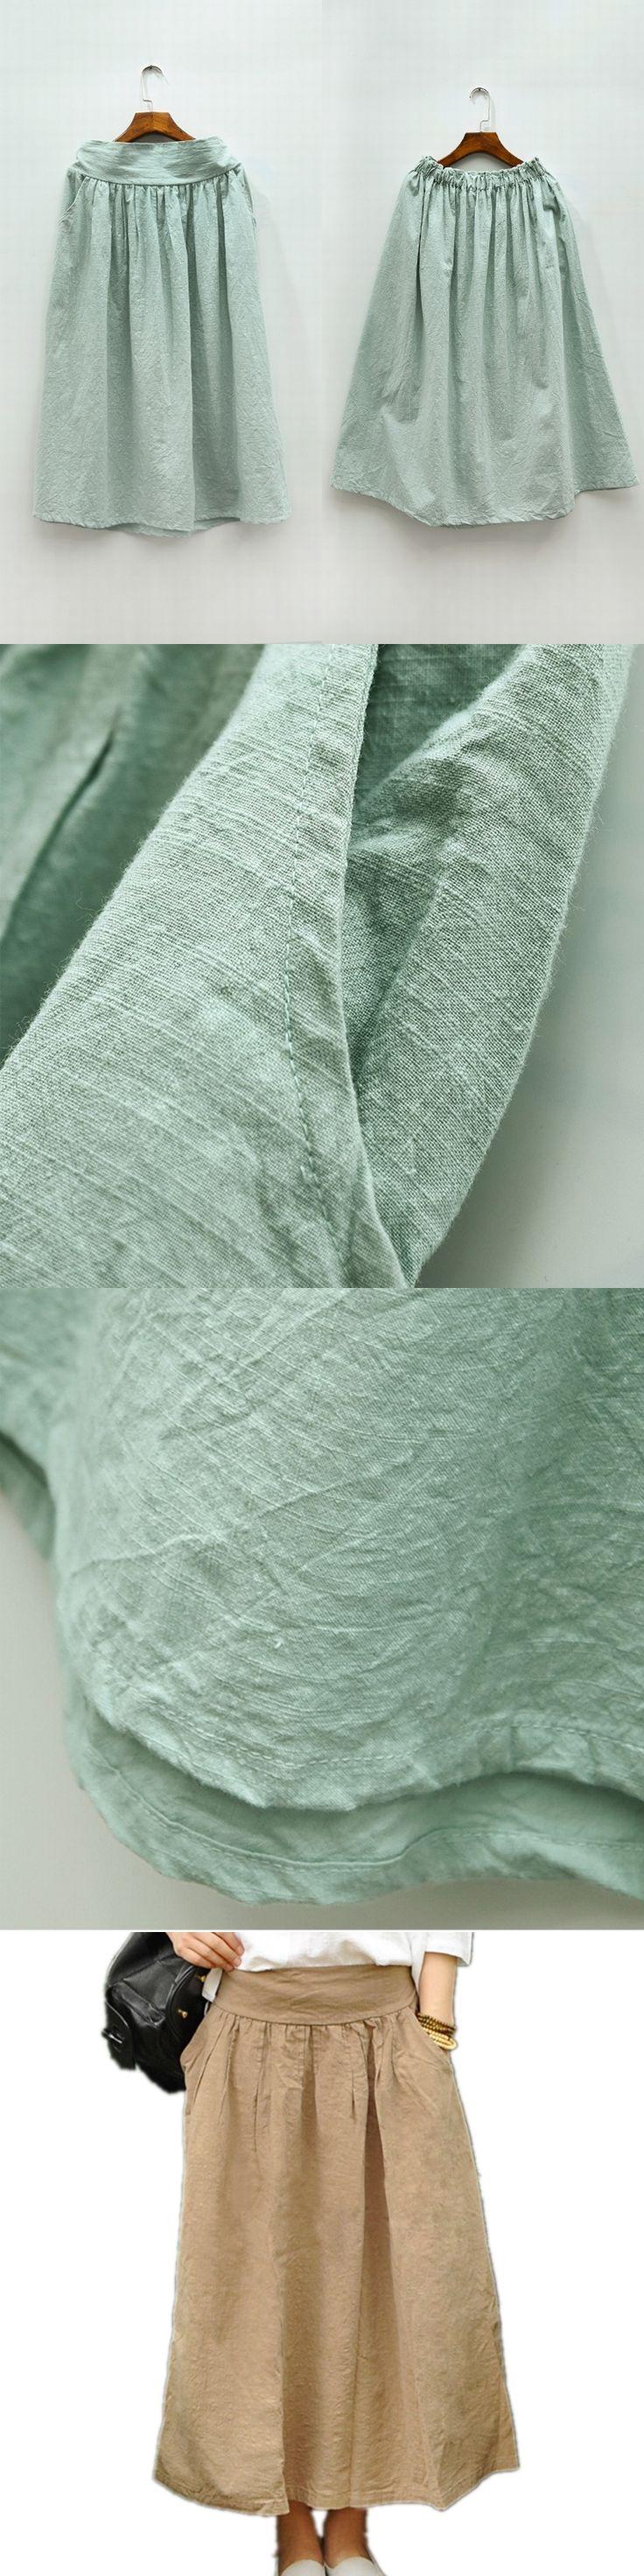 Mori Maxi Skirt High Quality Cotton Linen Pleated Skirt Basic Solid Green Blue Khaki White Pocket Long Maxi Skirts For Women